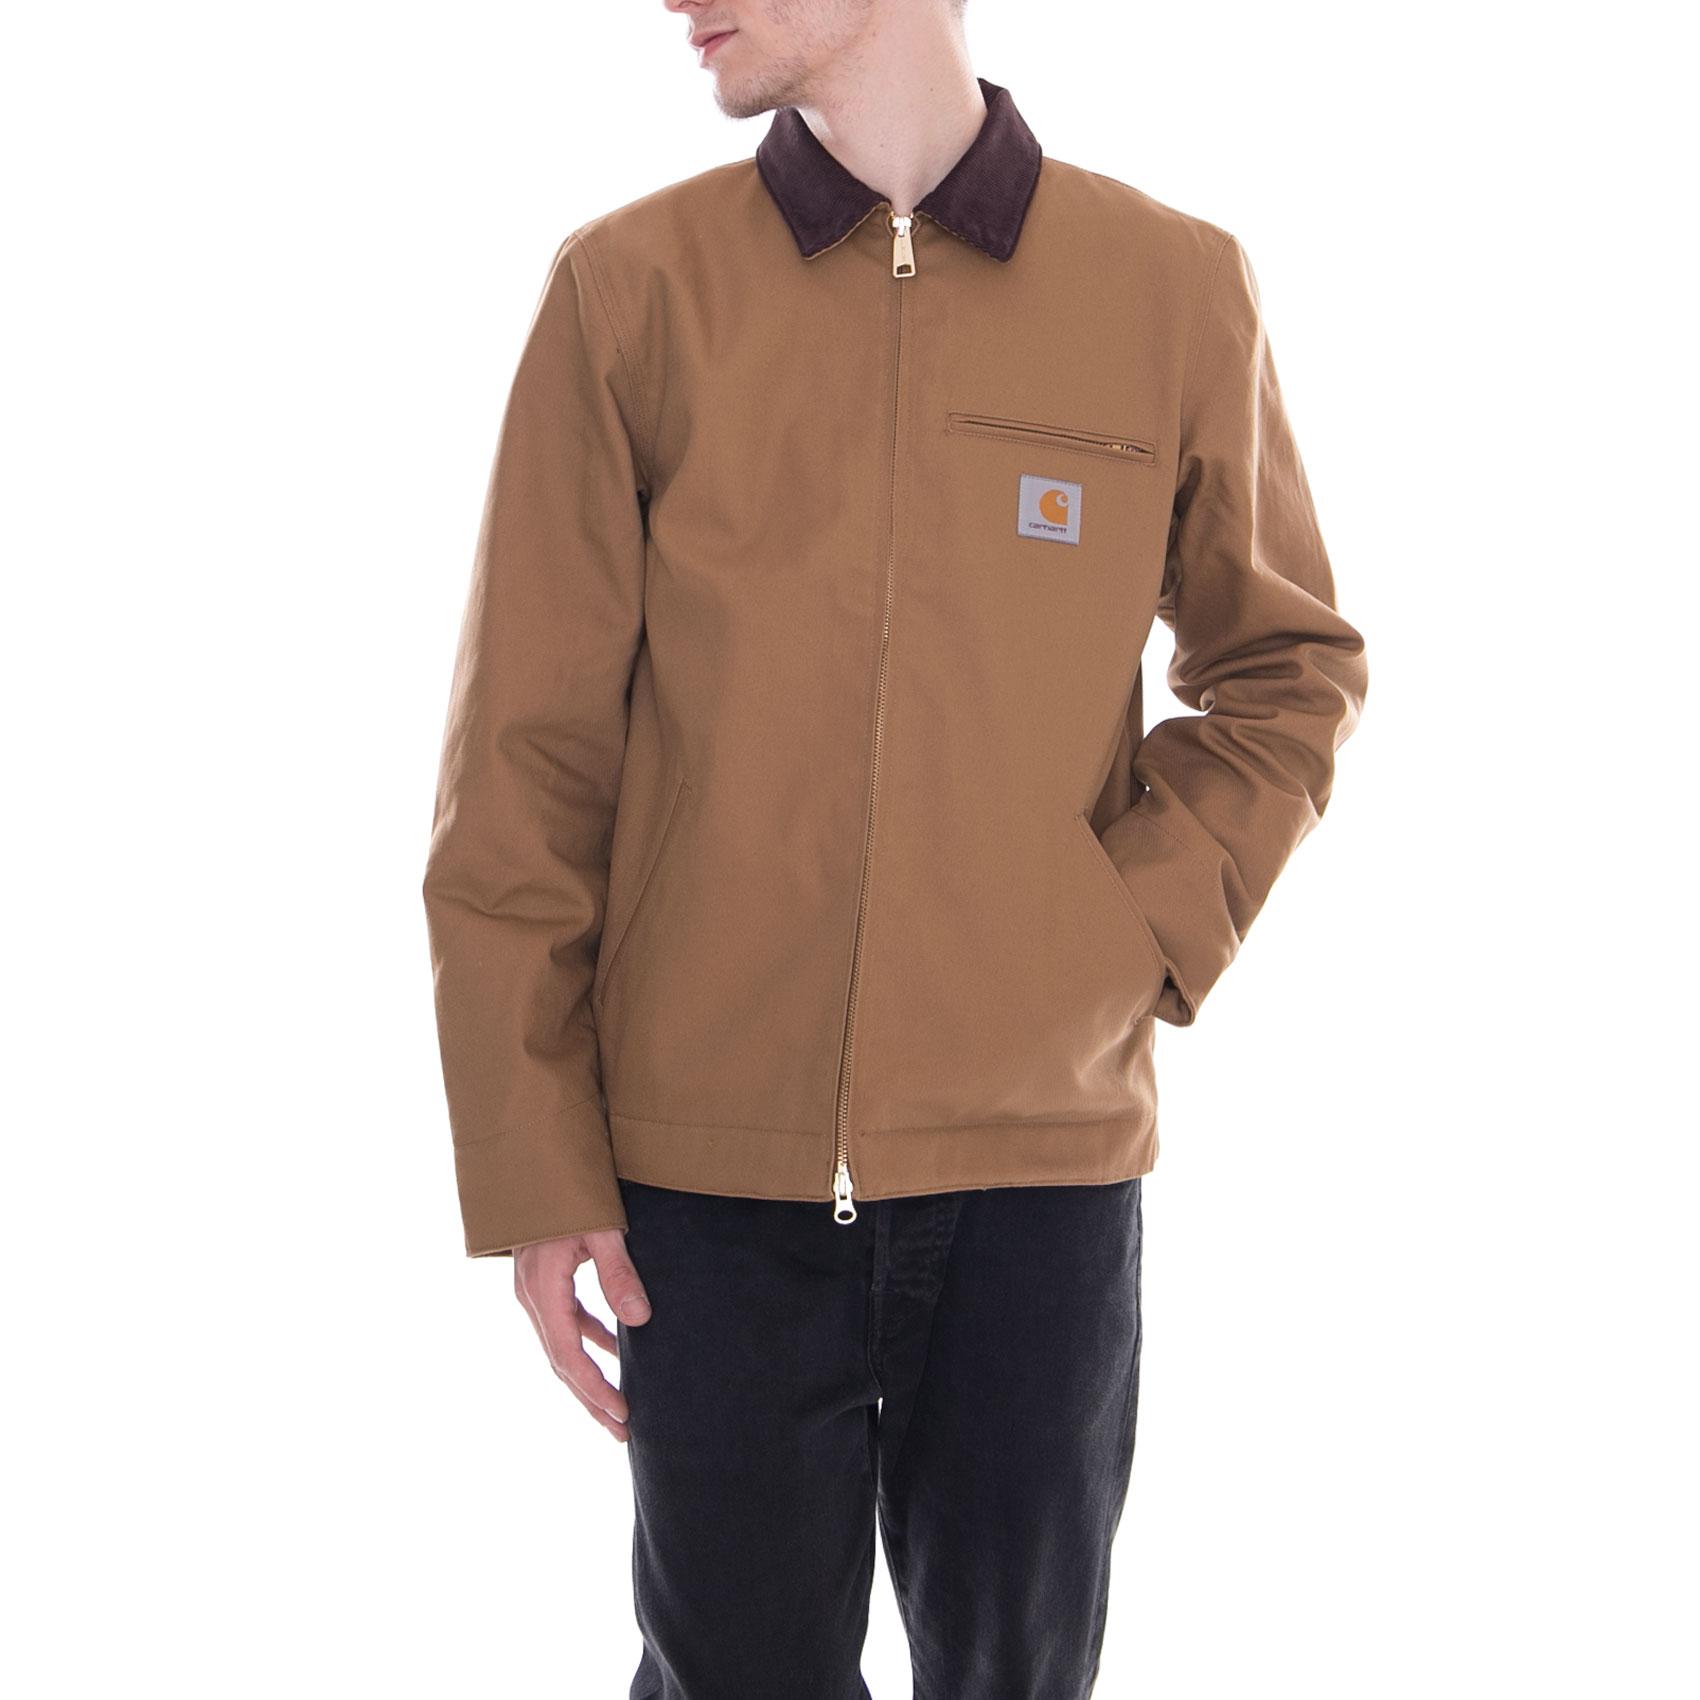 422d8ec1c27 Carhartt Jacket Detroit Jacket Hamilton Brown Brown | eBay